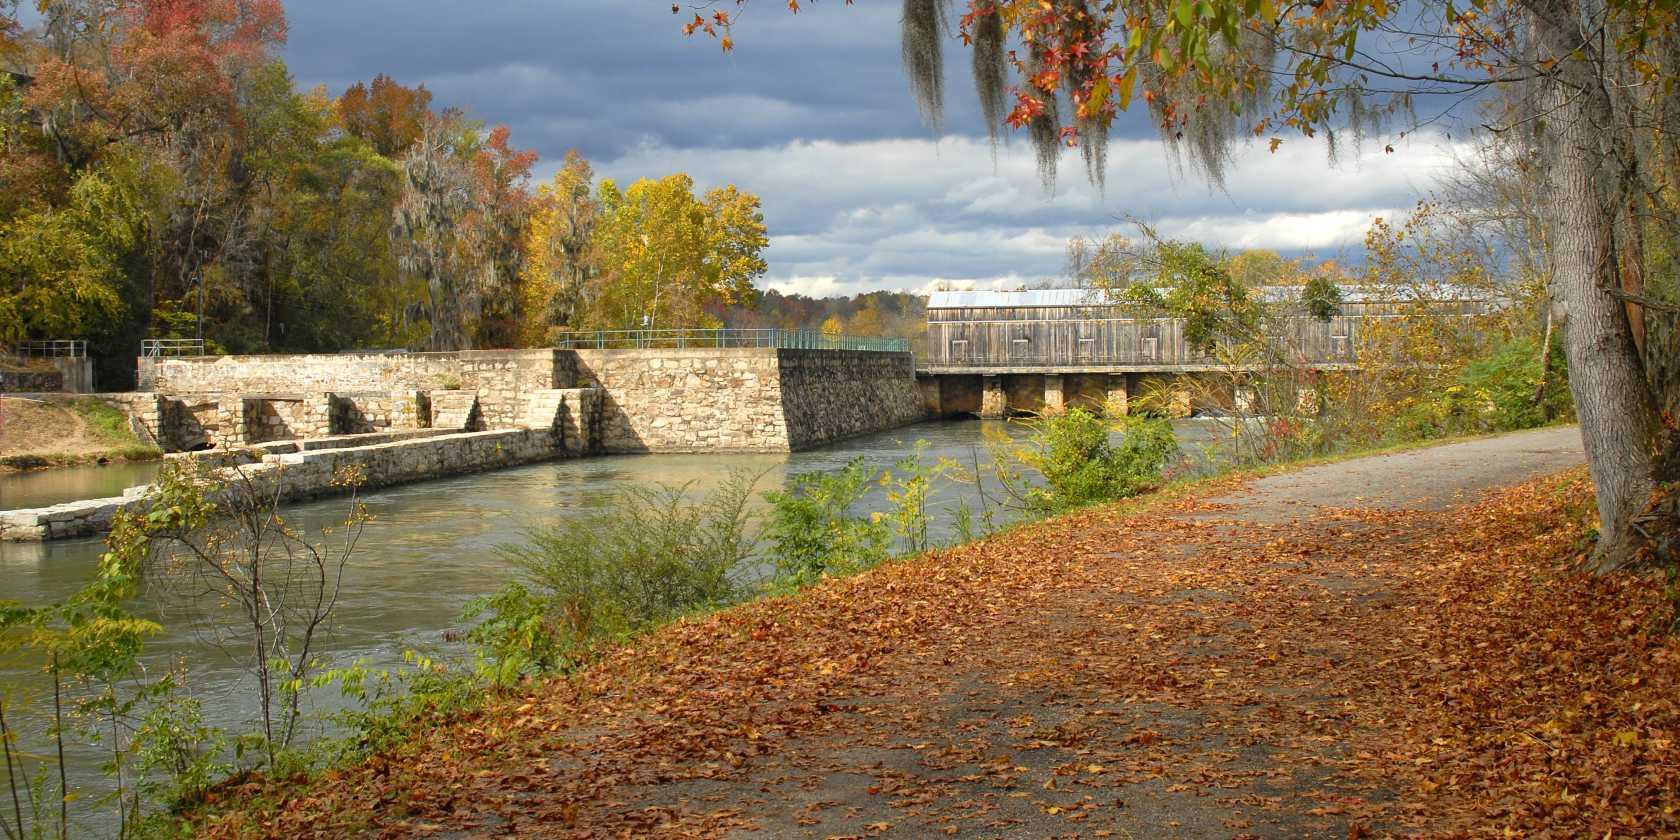 Augusta_Canal_Headgate_Locks_Autumn_view_Credit_Reggie_Fraser_b0e63dd9-5325-42d8-8f35-0668cee62570.jpg